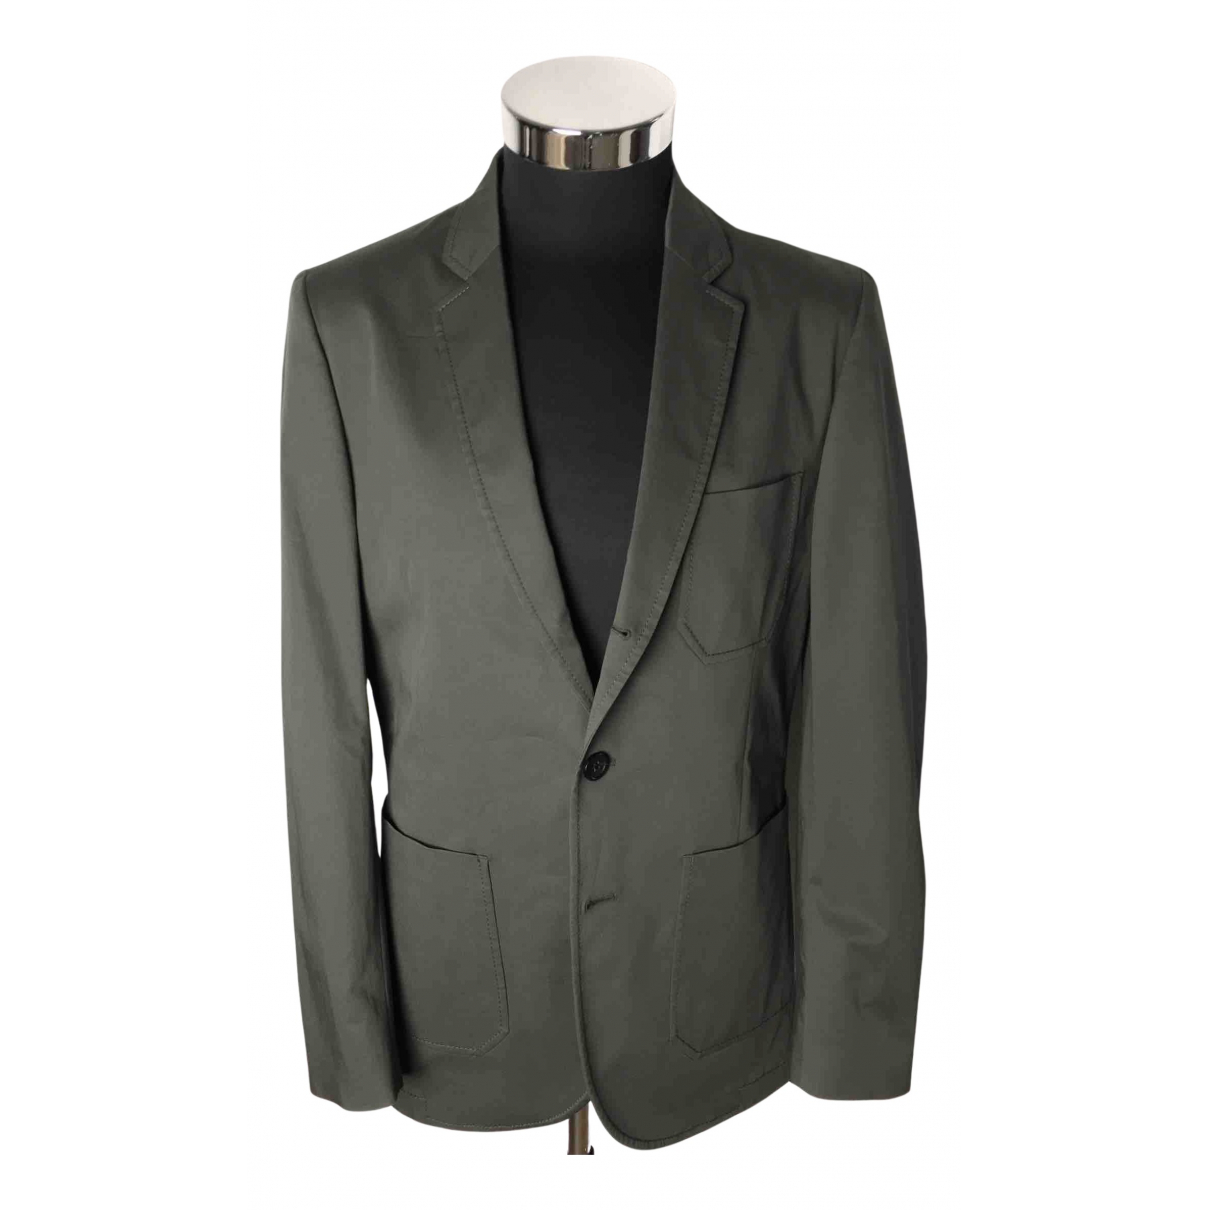 Paul Smith N Cotton jacket  for Men 38 UK - US